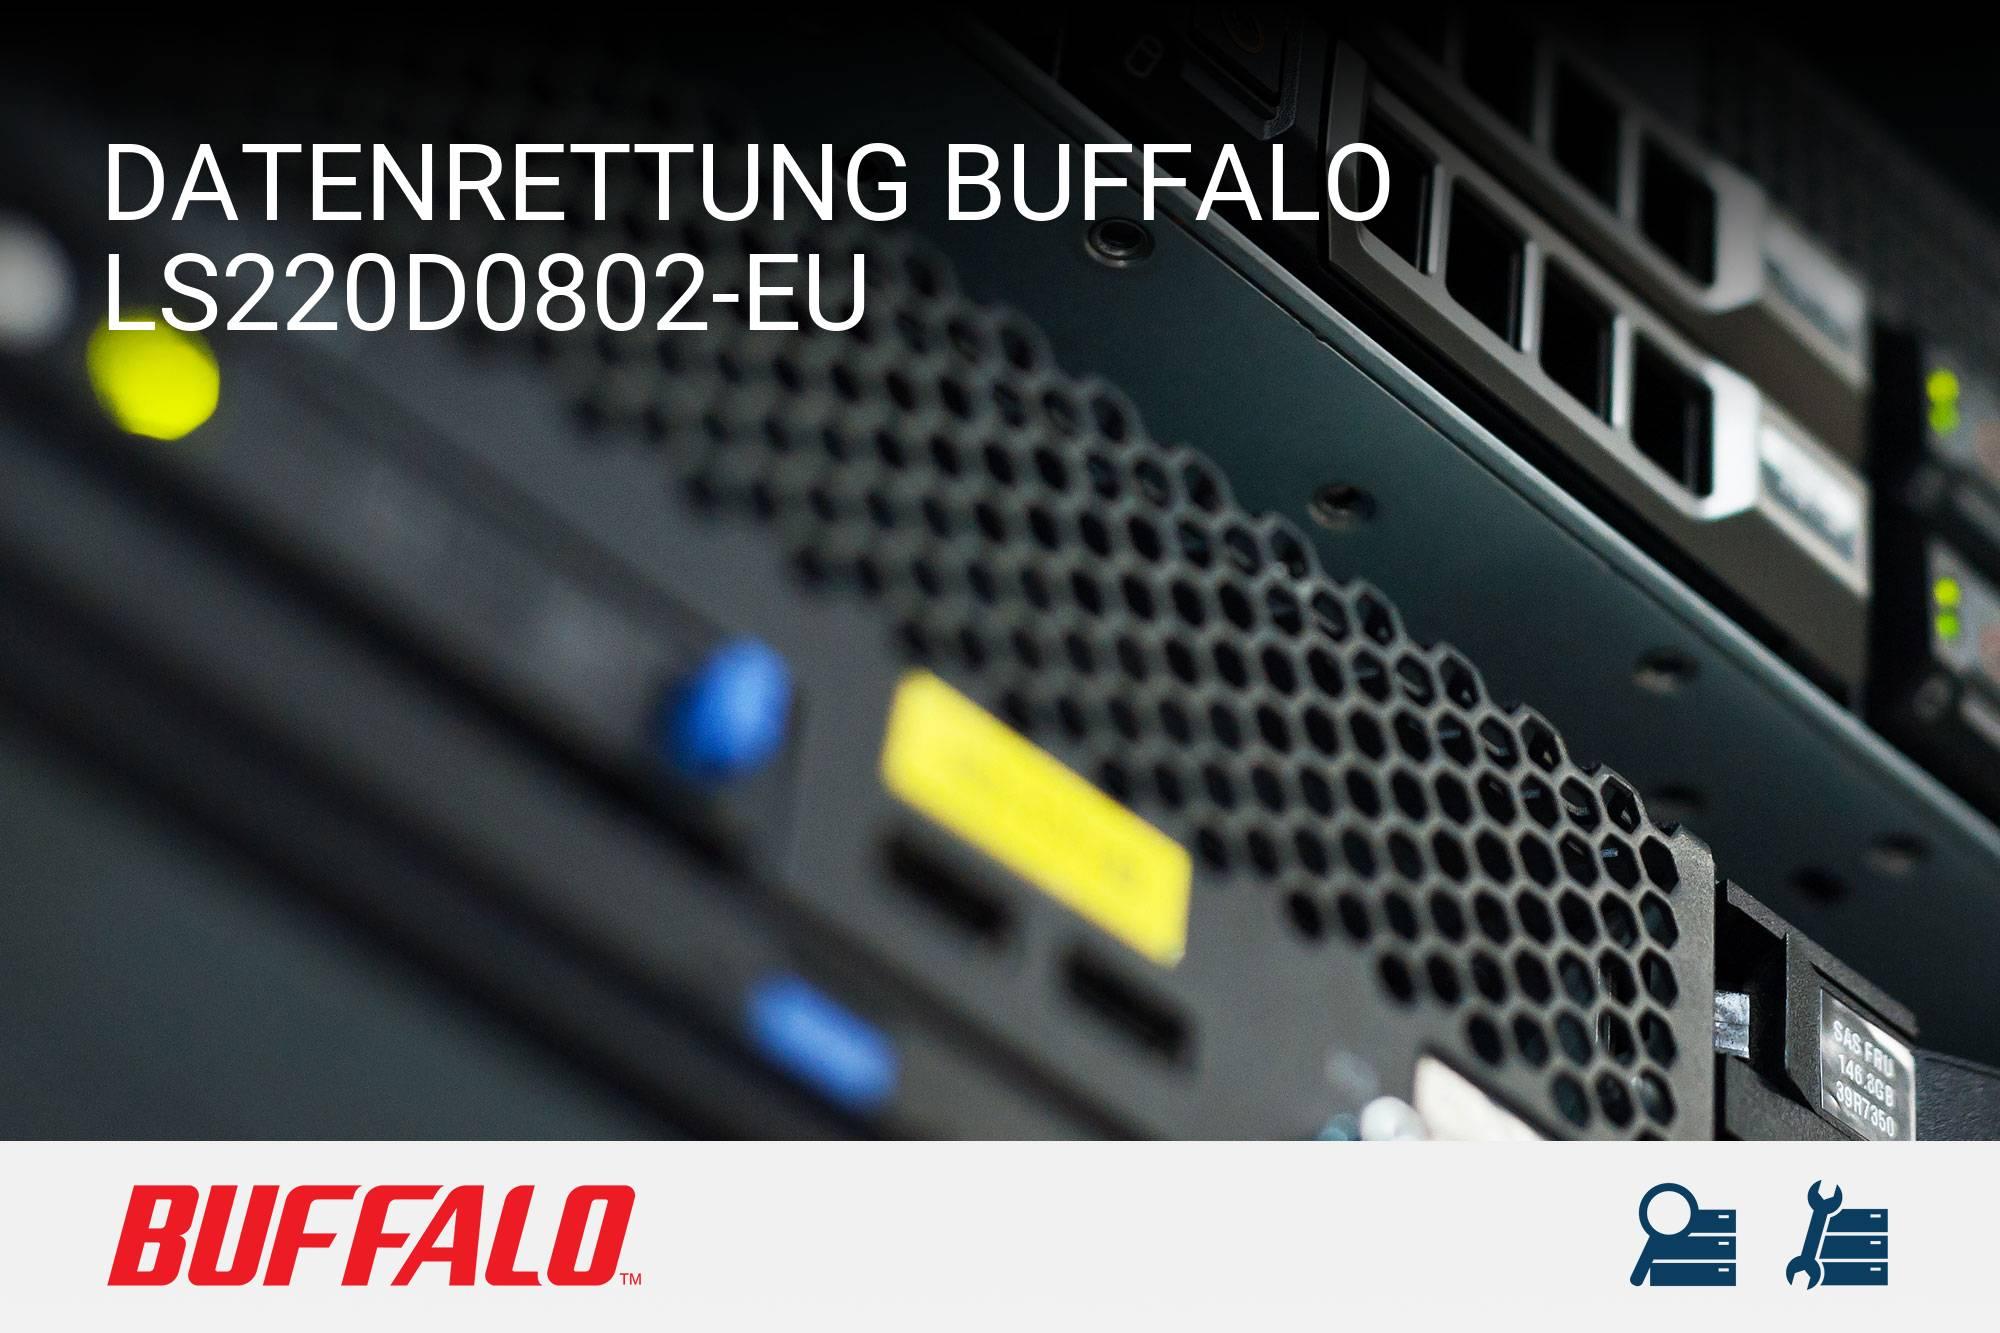 Buffalo LS220D0802-EU